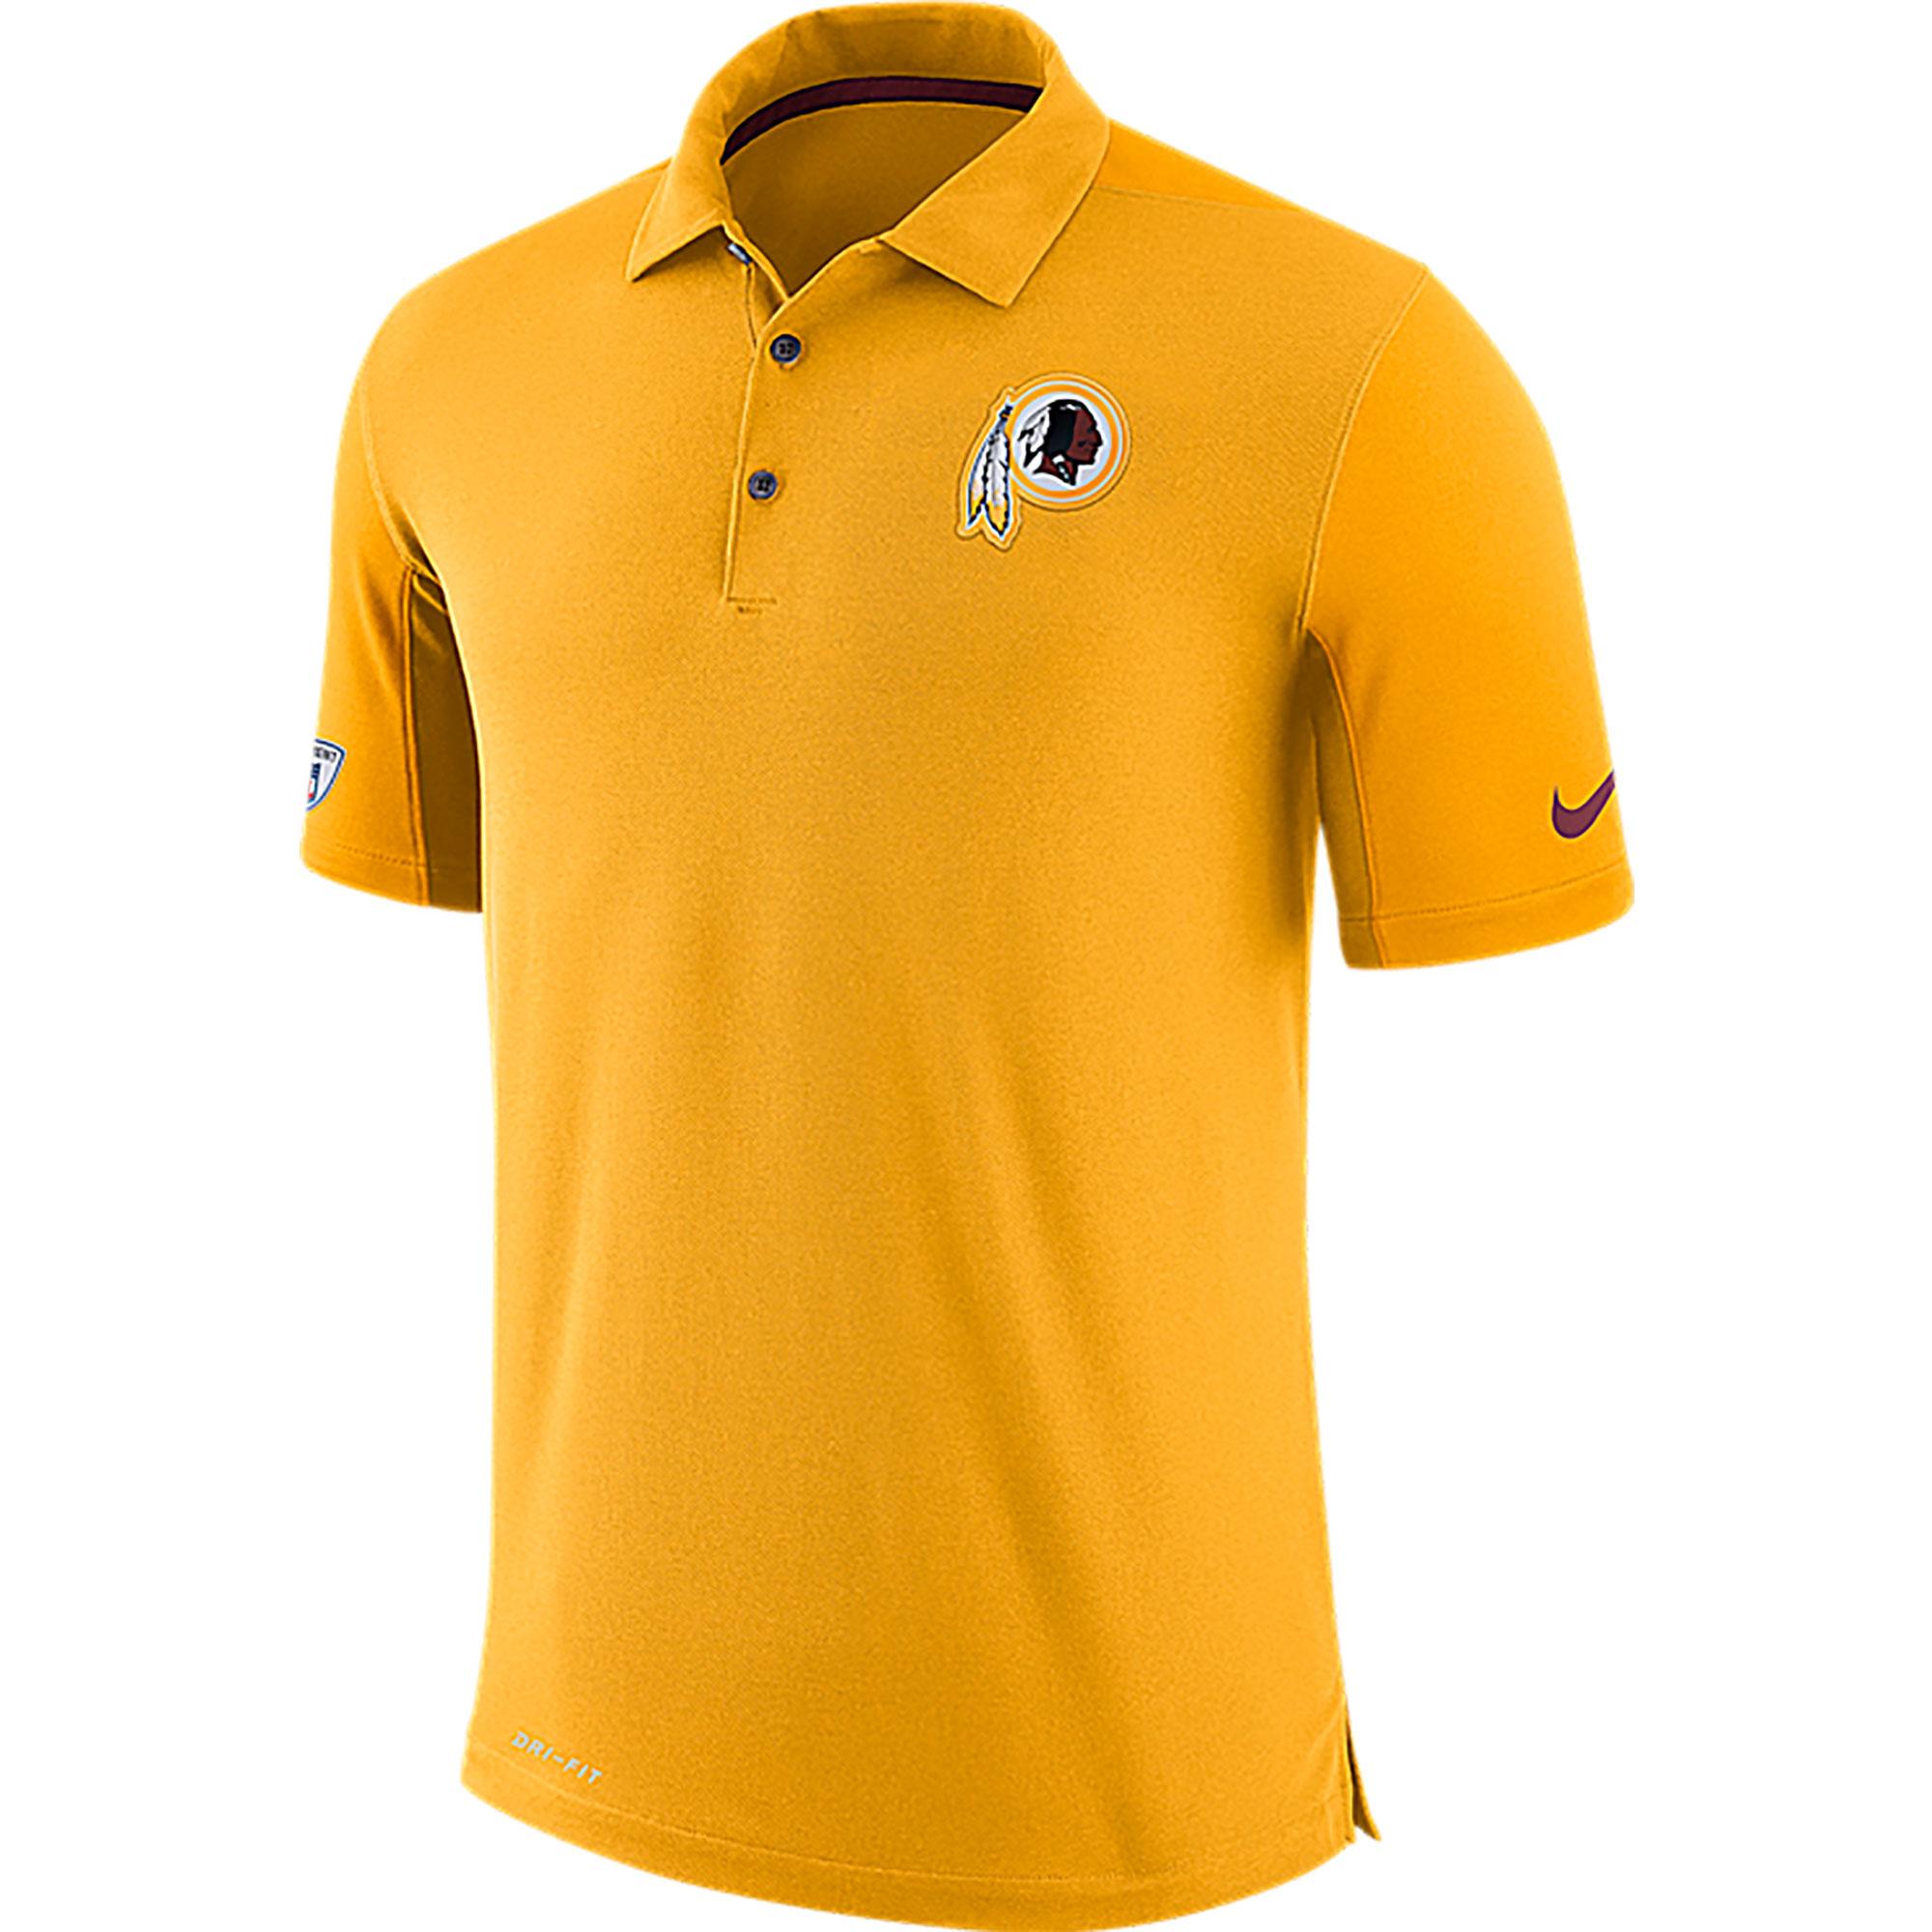 Nike Washington Redskins Sideline Team Issue Dri-FIT Poloshirt